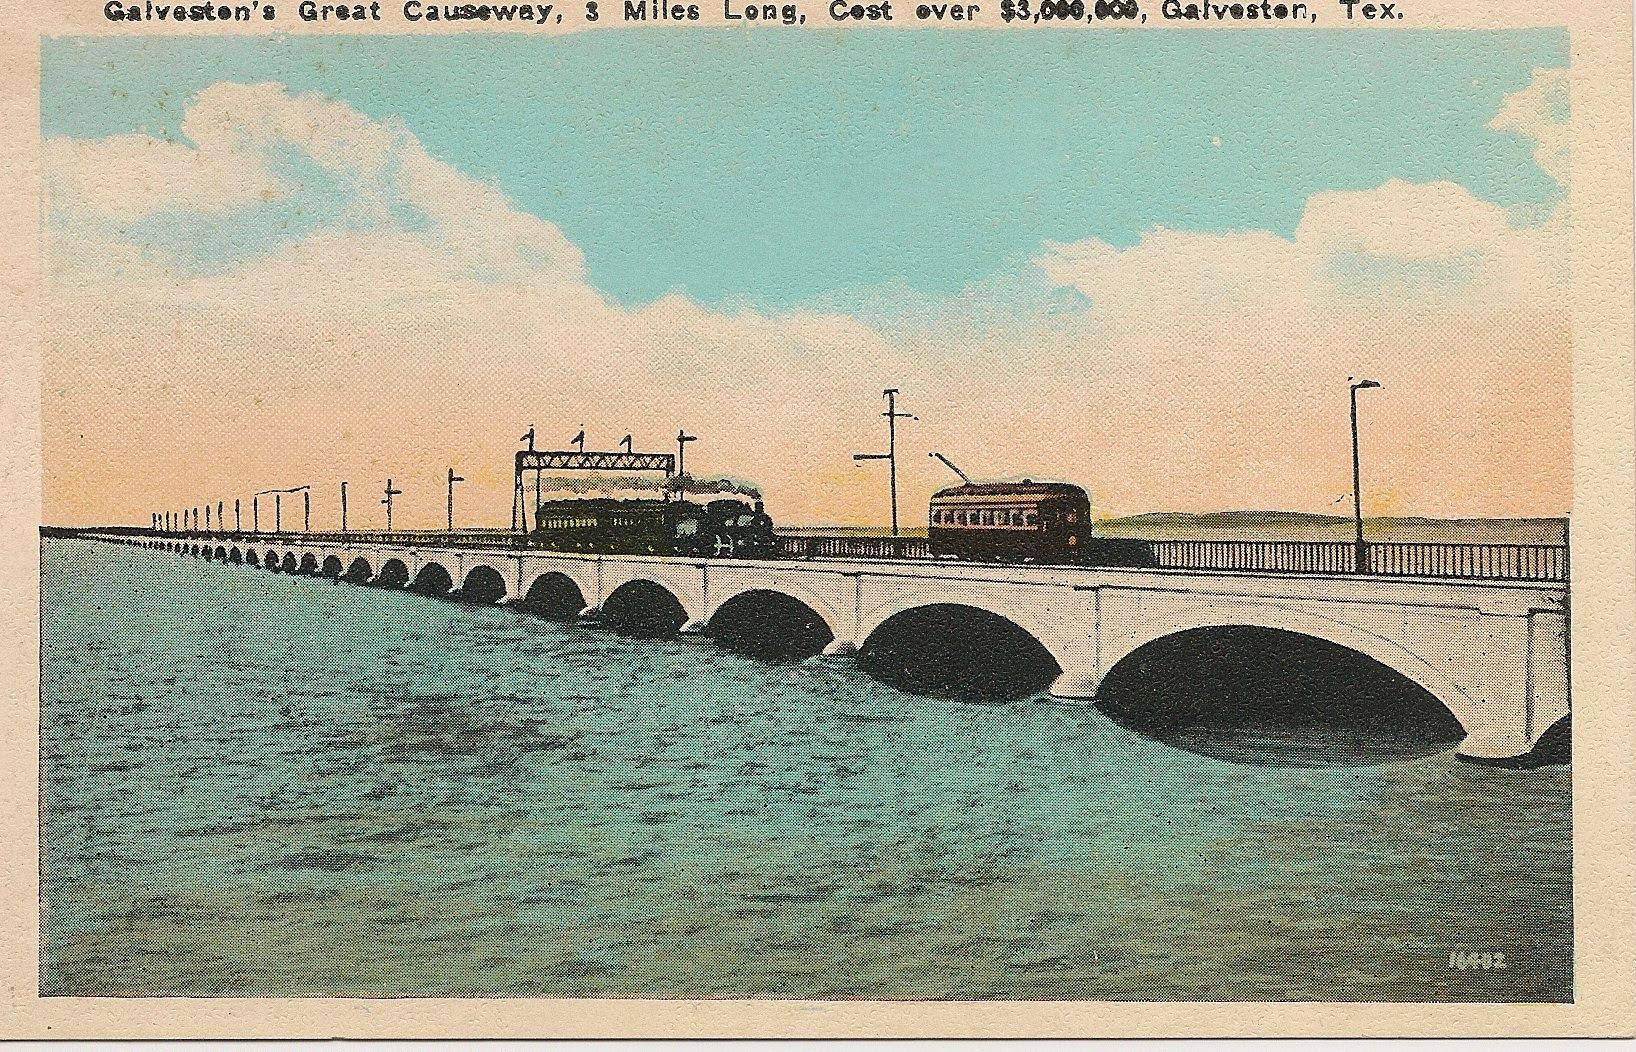 Galveston Causeway: Vintage Linen Look Postcard